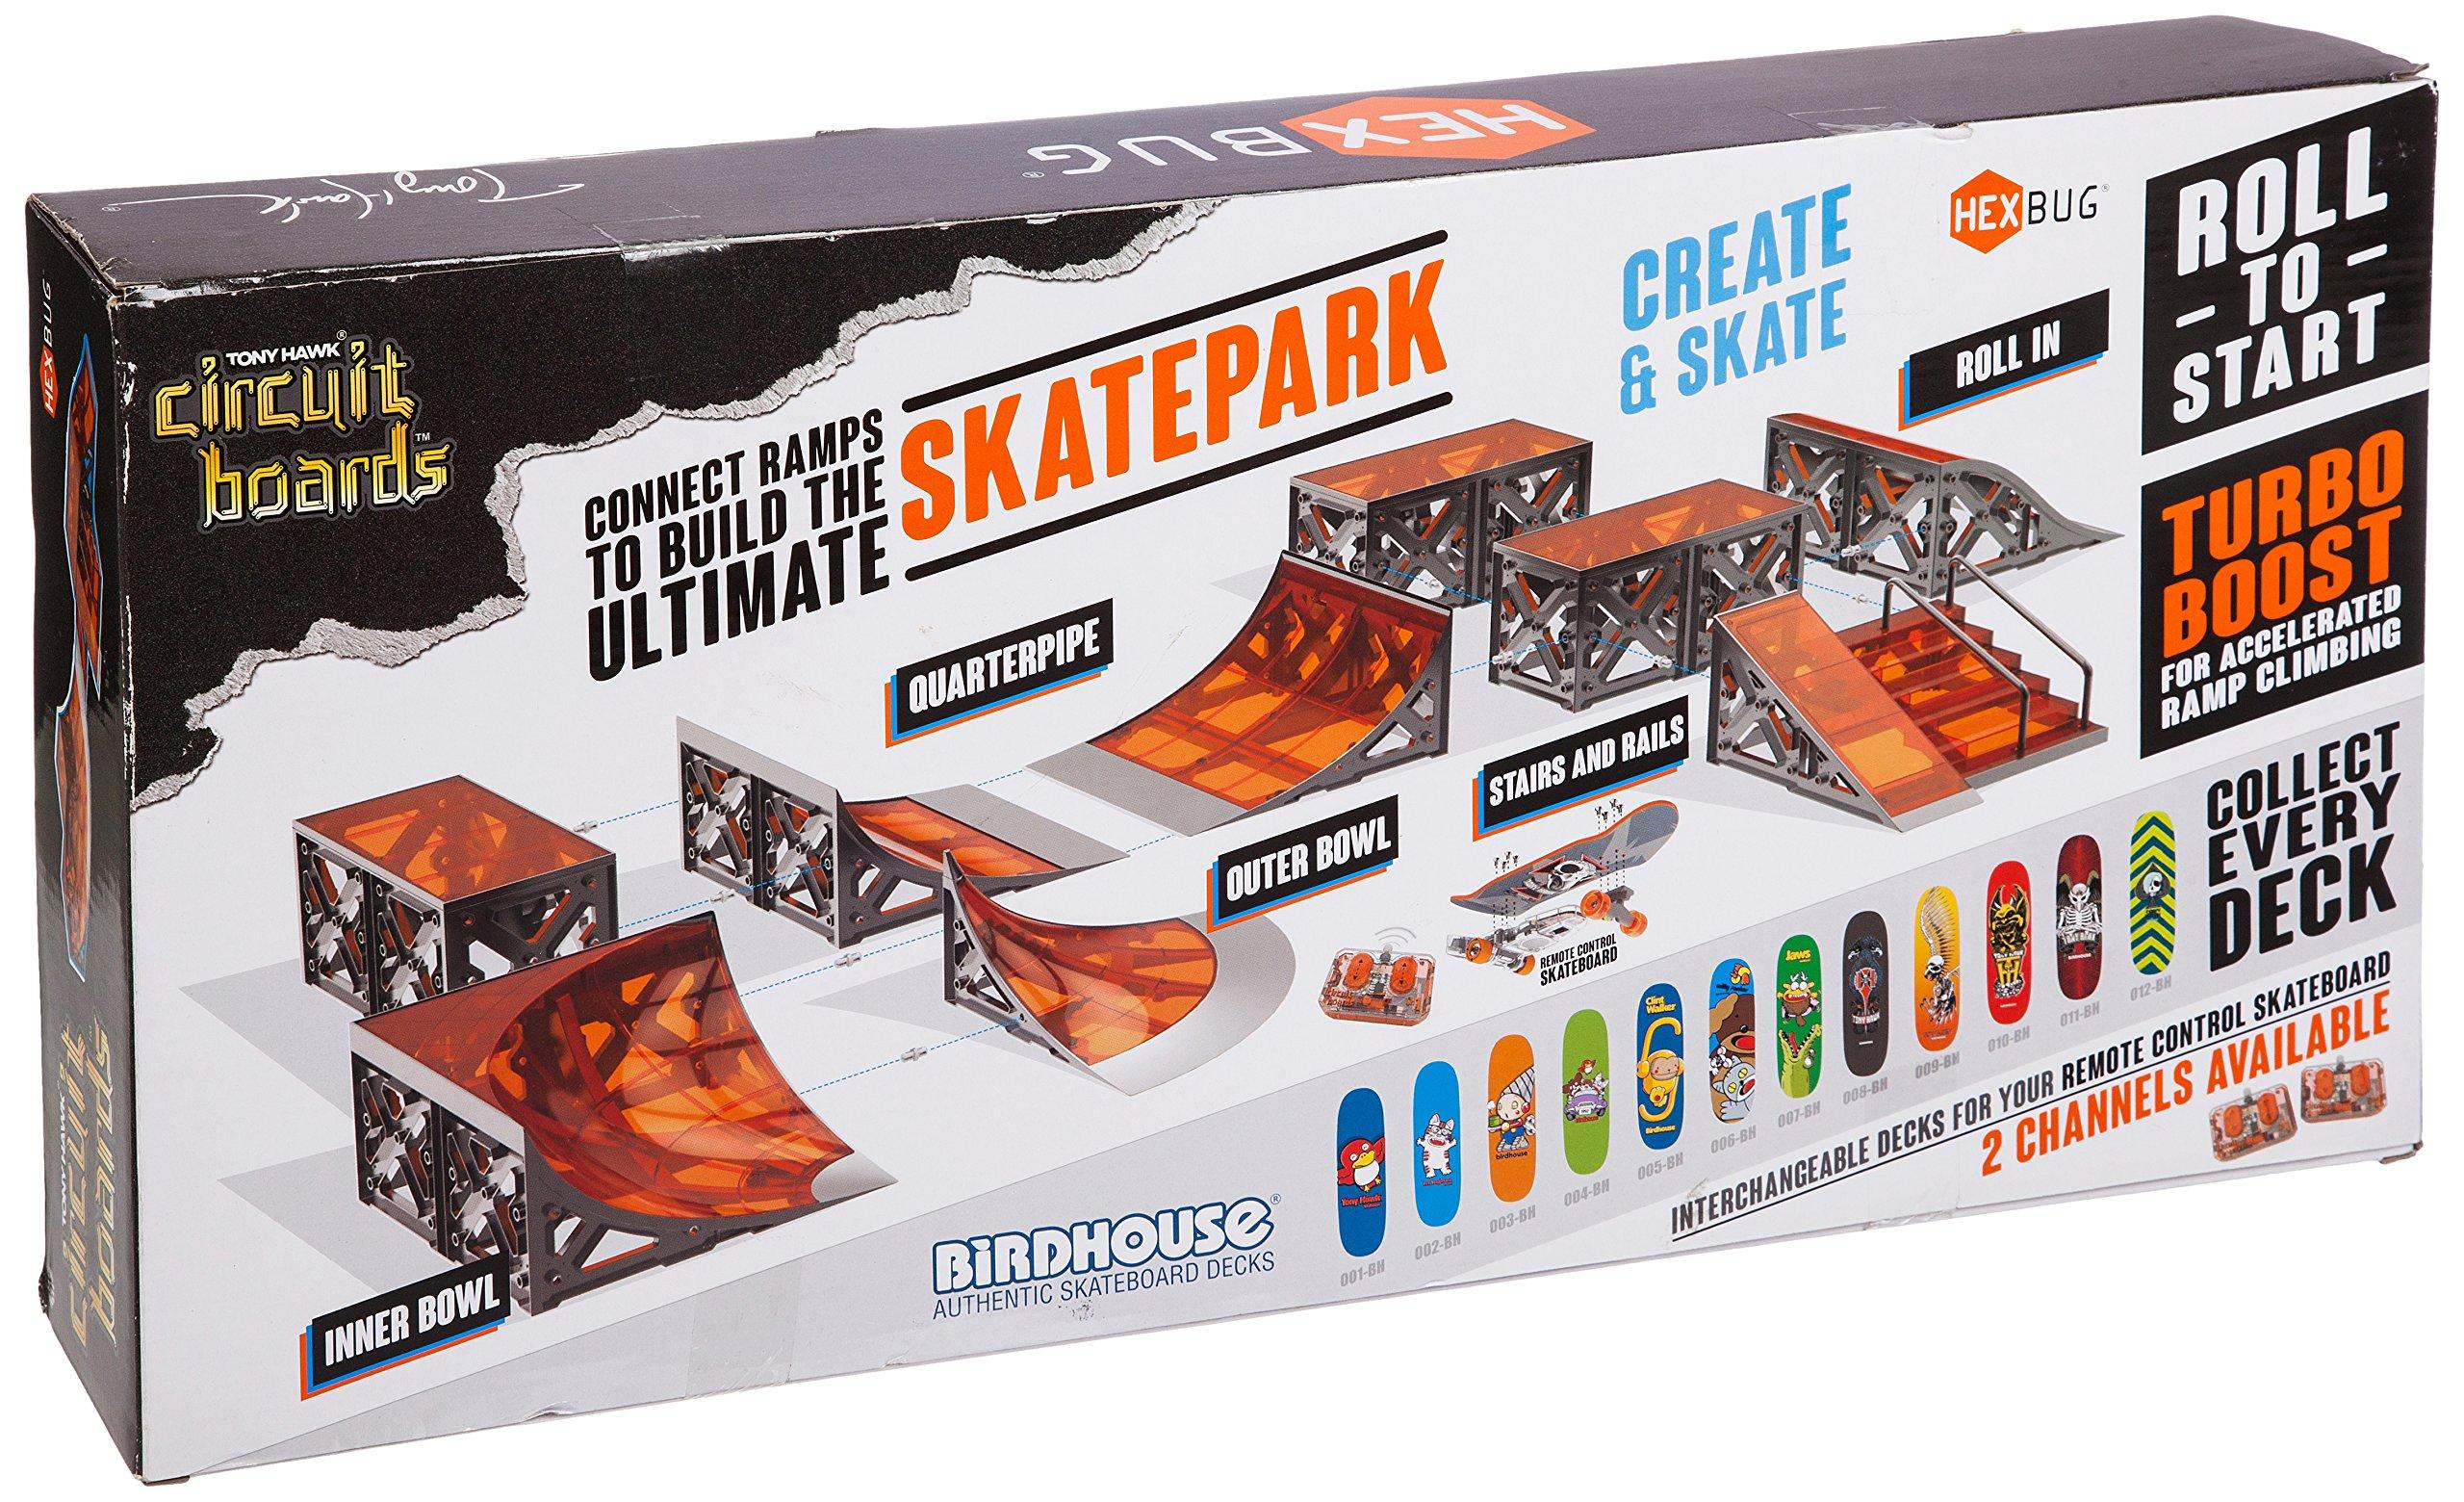 HEXBUG Tony Hawk Circuit Boards Skatepark - Colors May Vary by HEXBUG (Image #1)